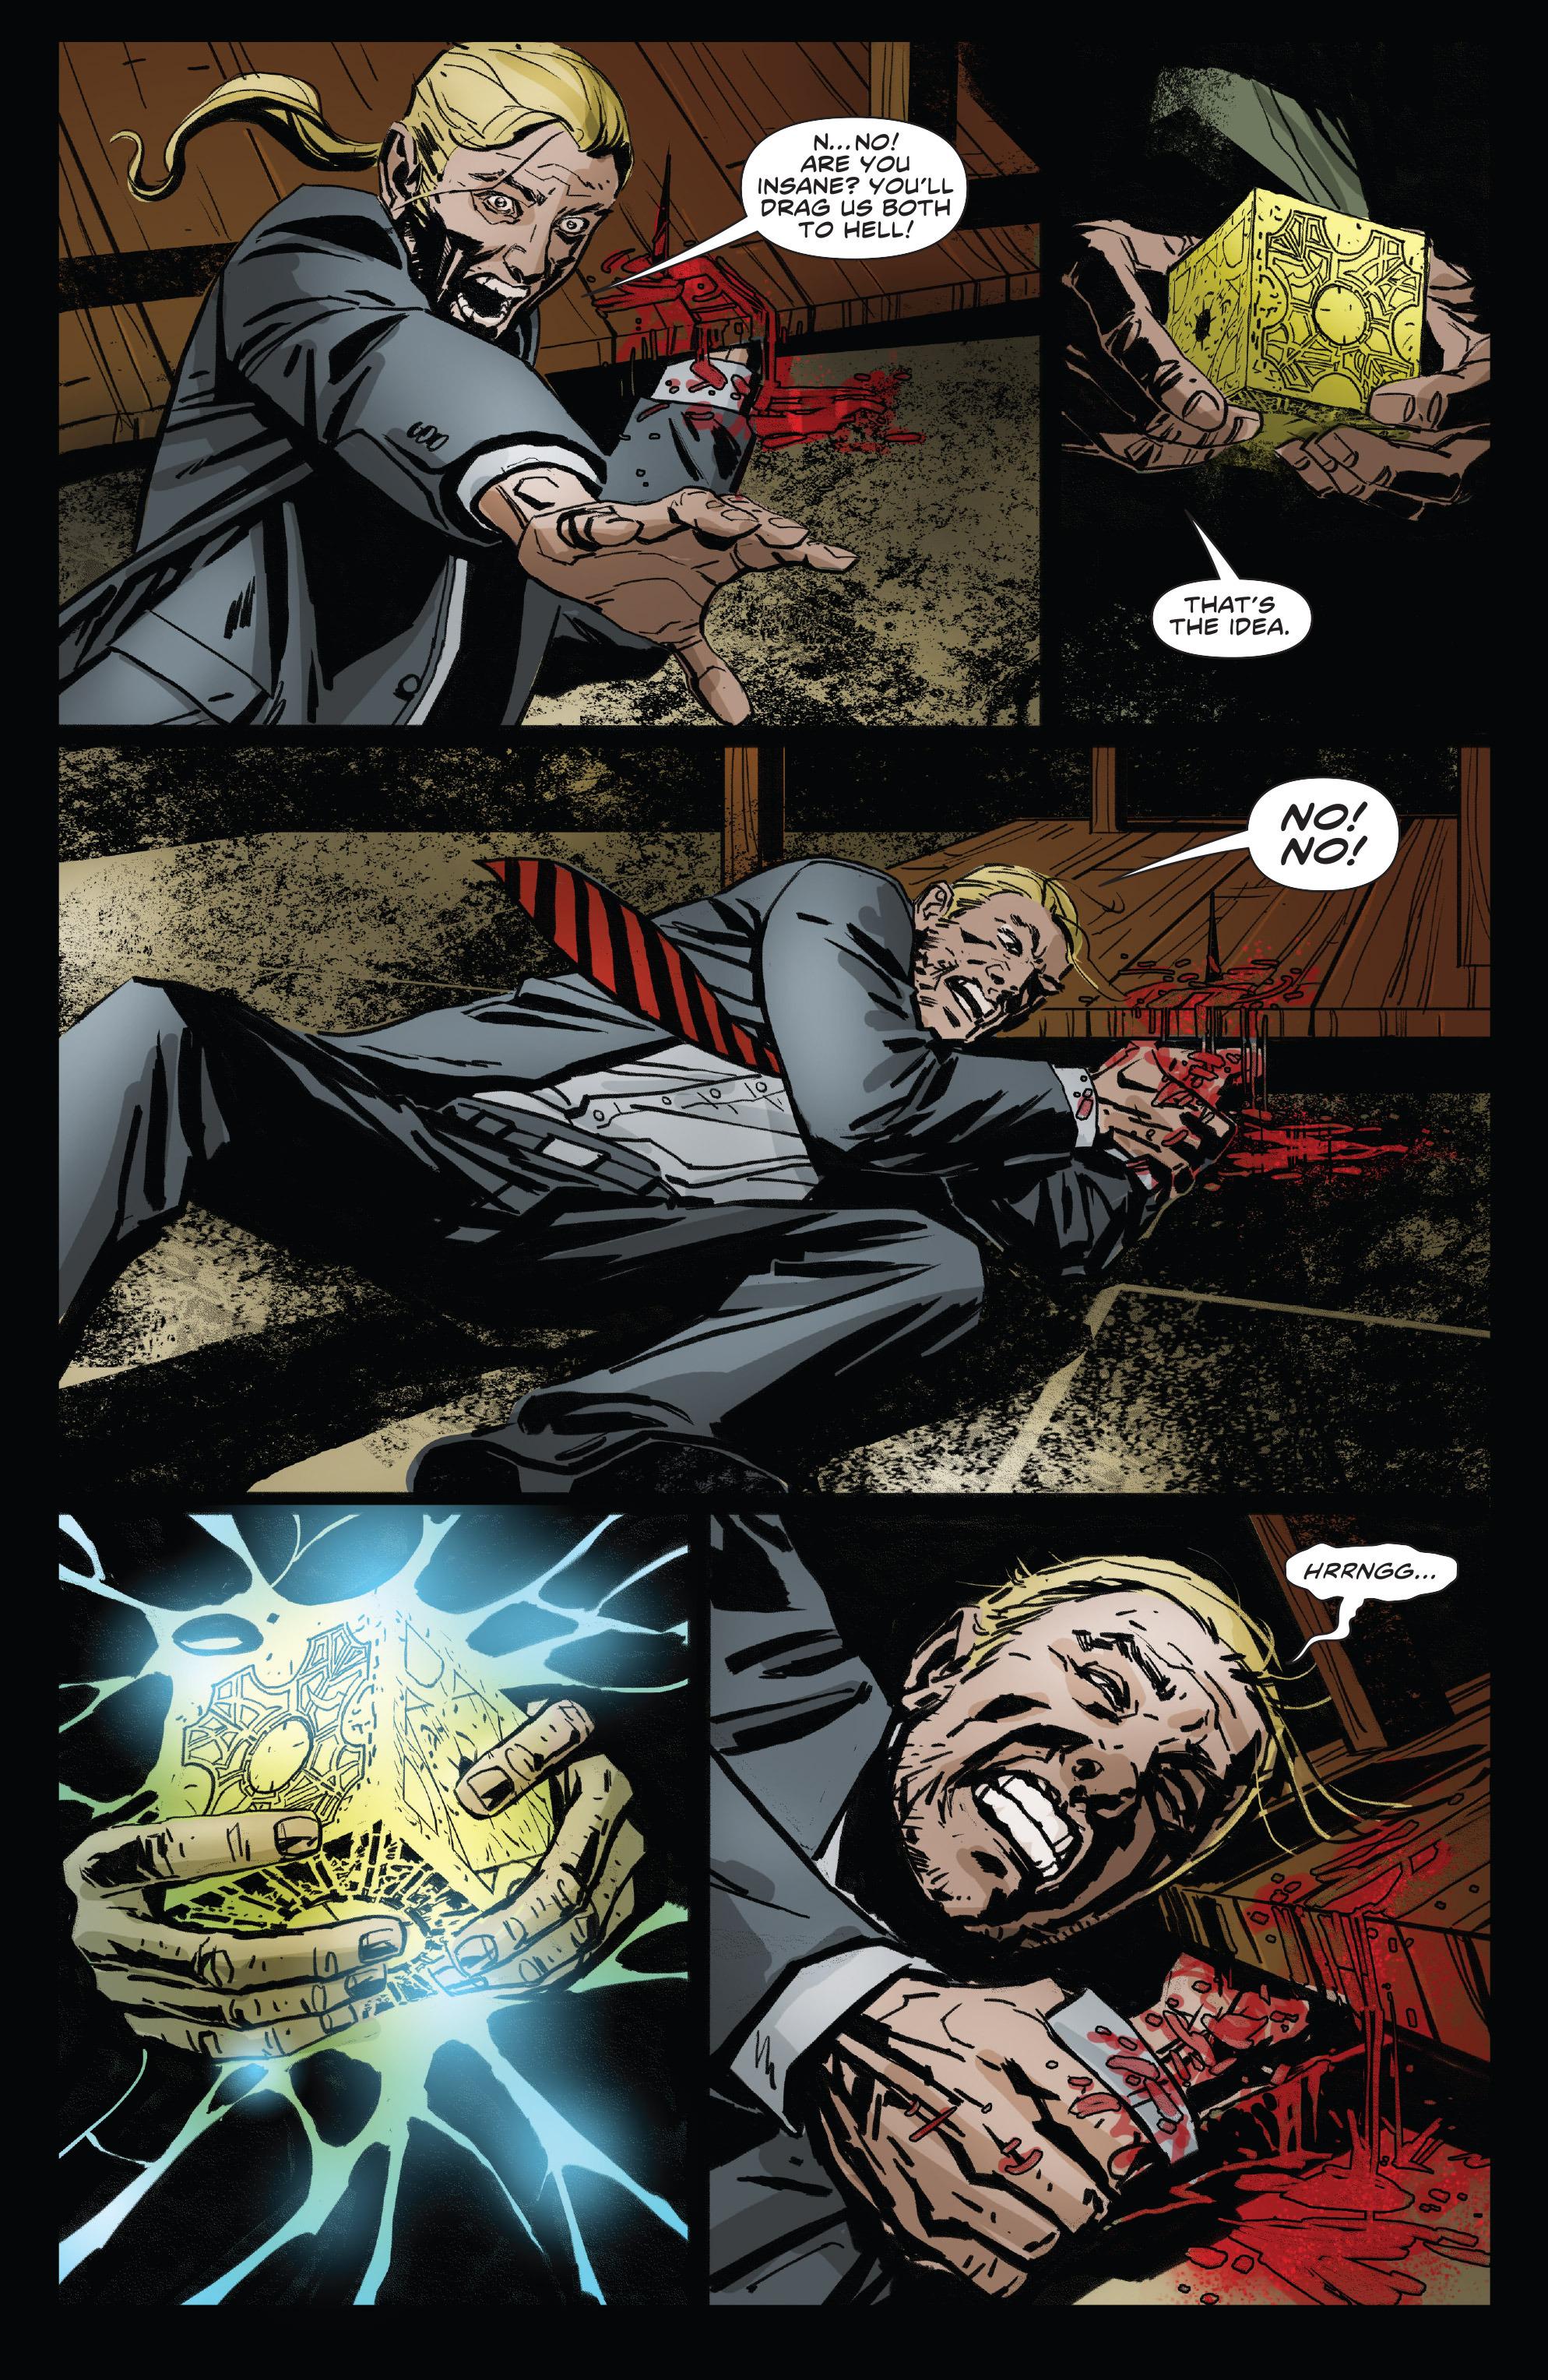 Read online Clive Barker's Hellraiser: The Dark Watch comic -  Issue # TPB 3 - 21